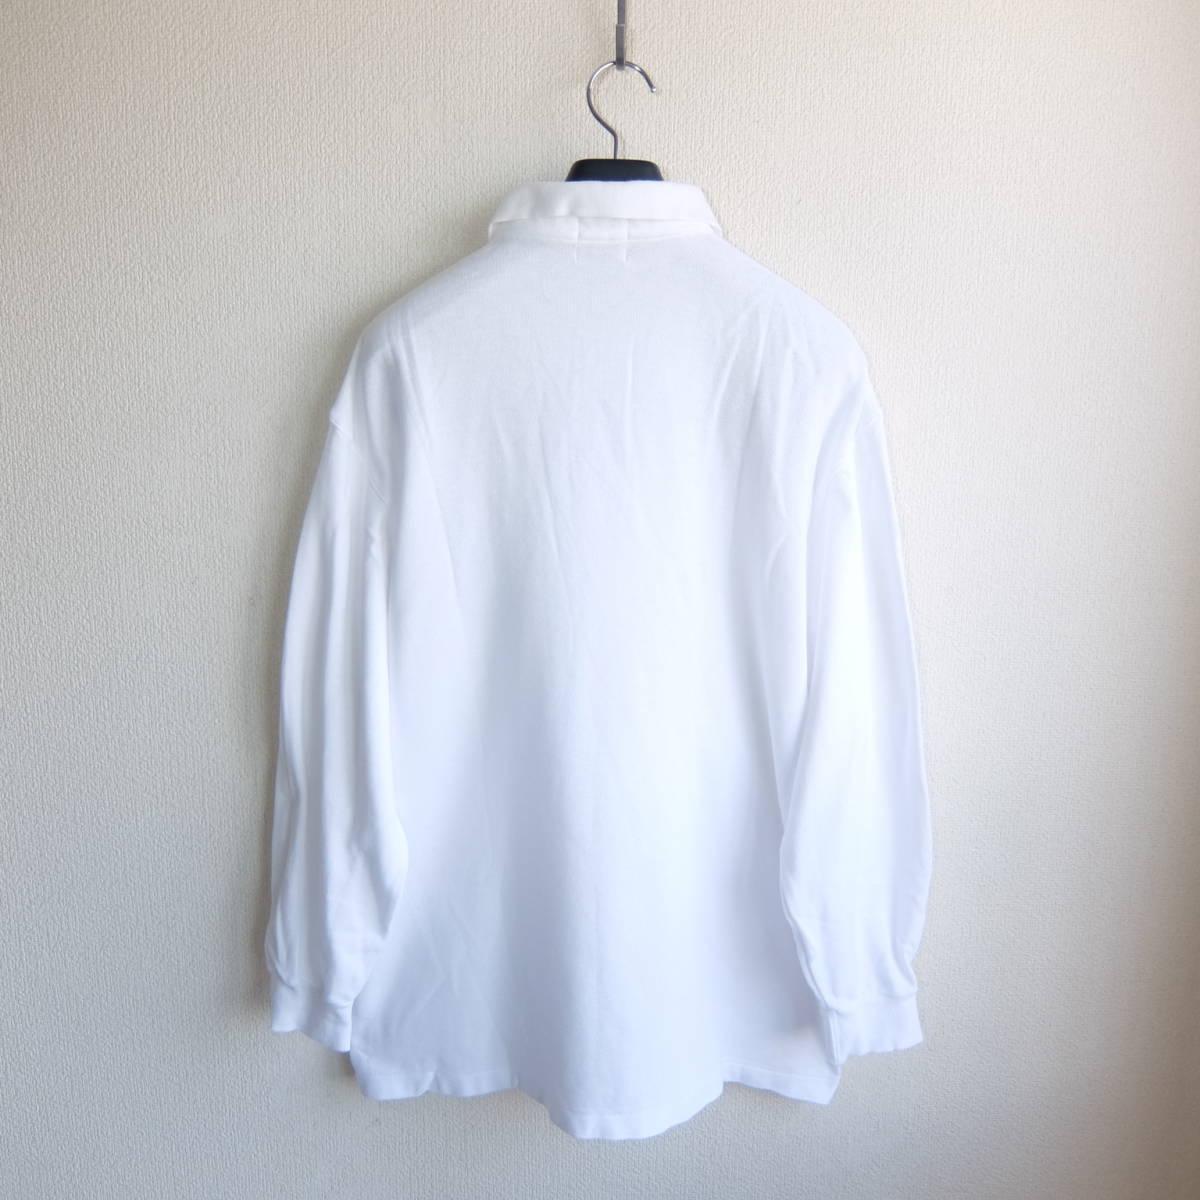 SINA COVA シナコバ ワッペン付き 長袖 ポロシャツ ホワイト Lサイズ_画像3